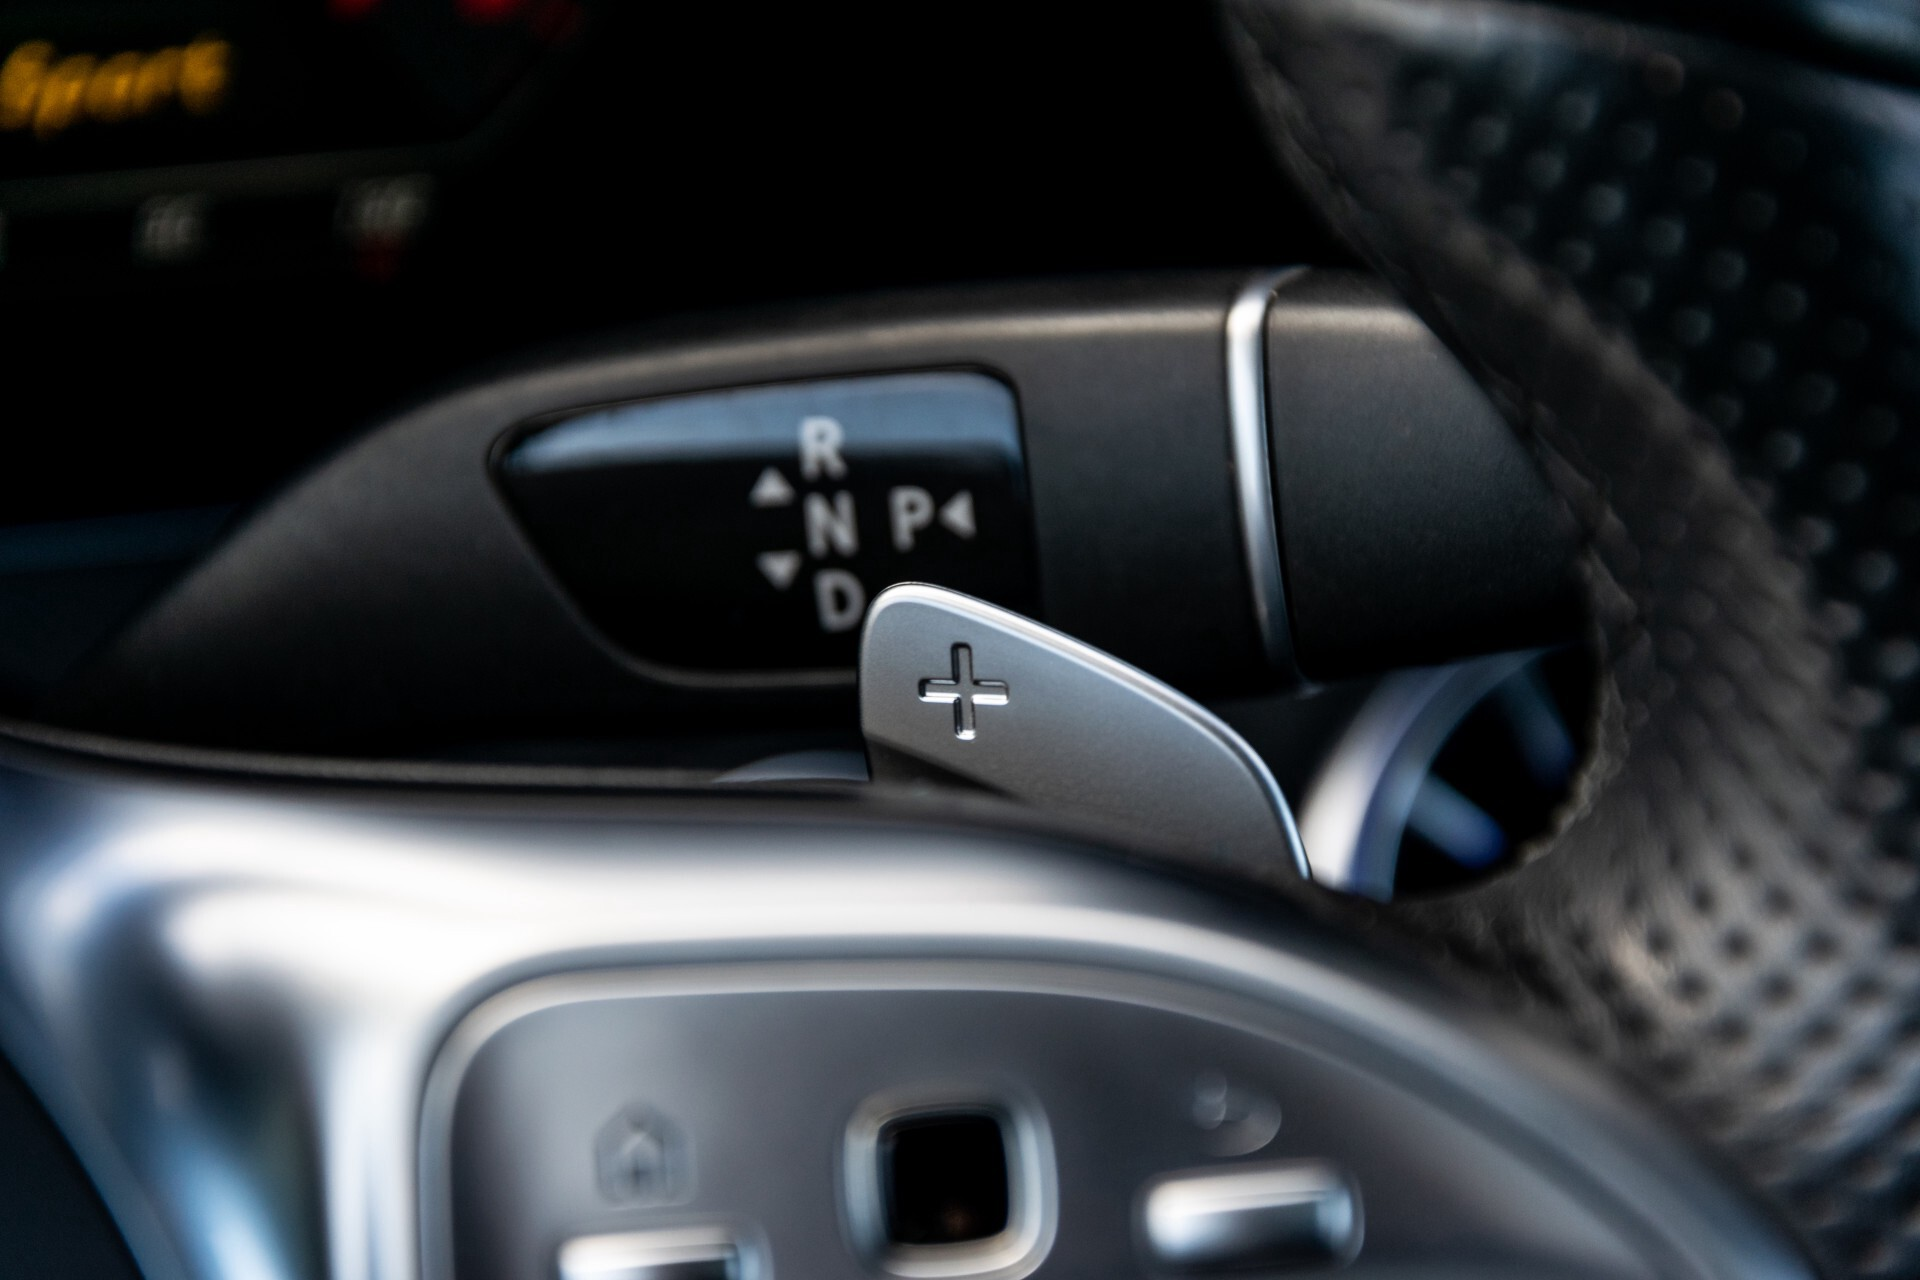 Mercedes-Benz E-Klasse Coupé 300 AMG Panorama/Rij-assist/Keyless/Massage/Memory/HUD/Standkachel/Night Aut9 Foto 14